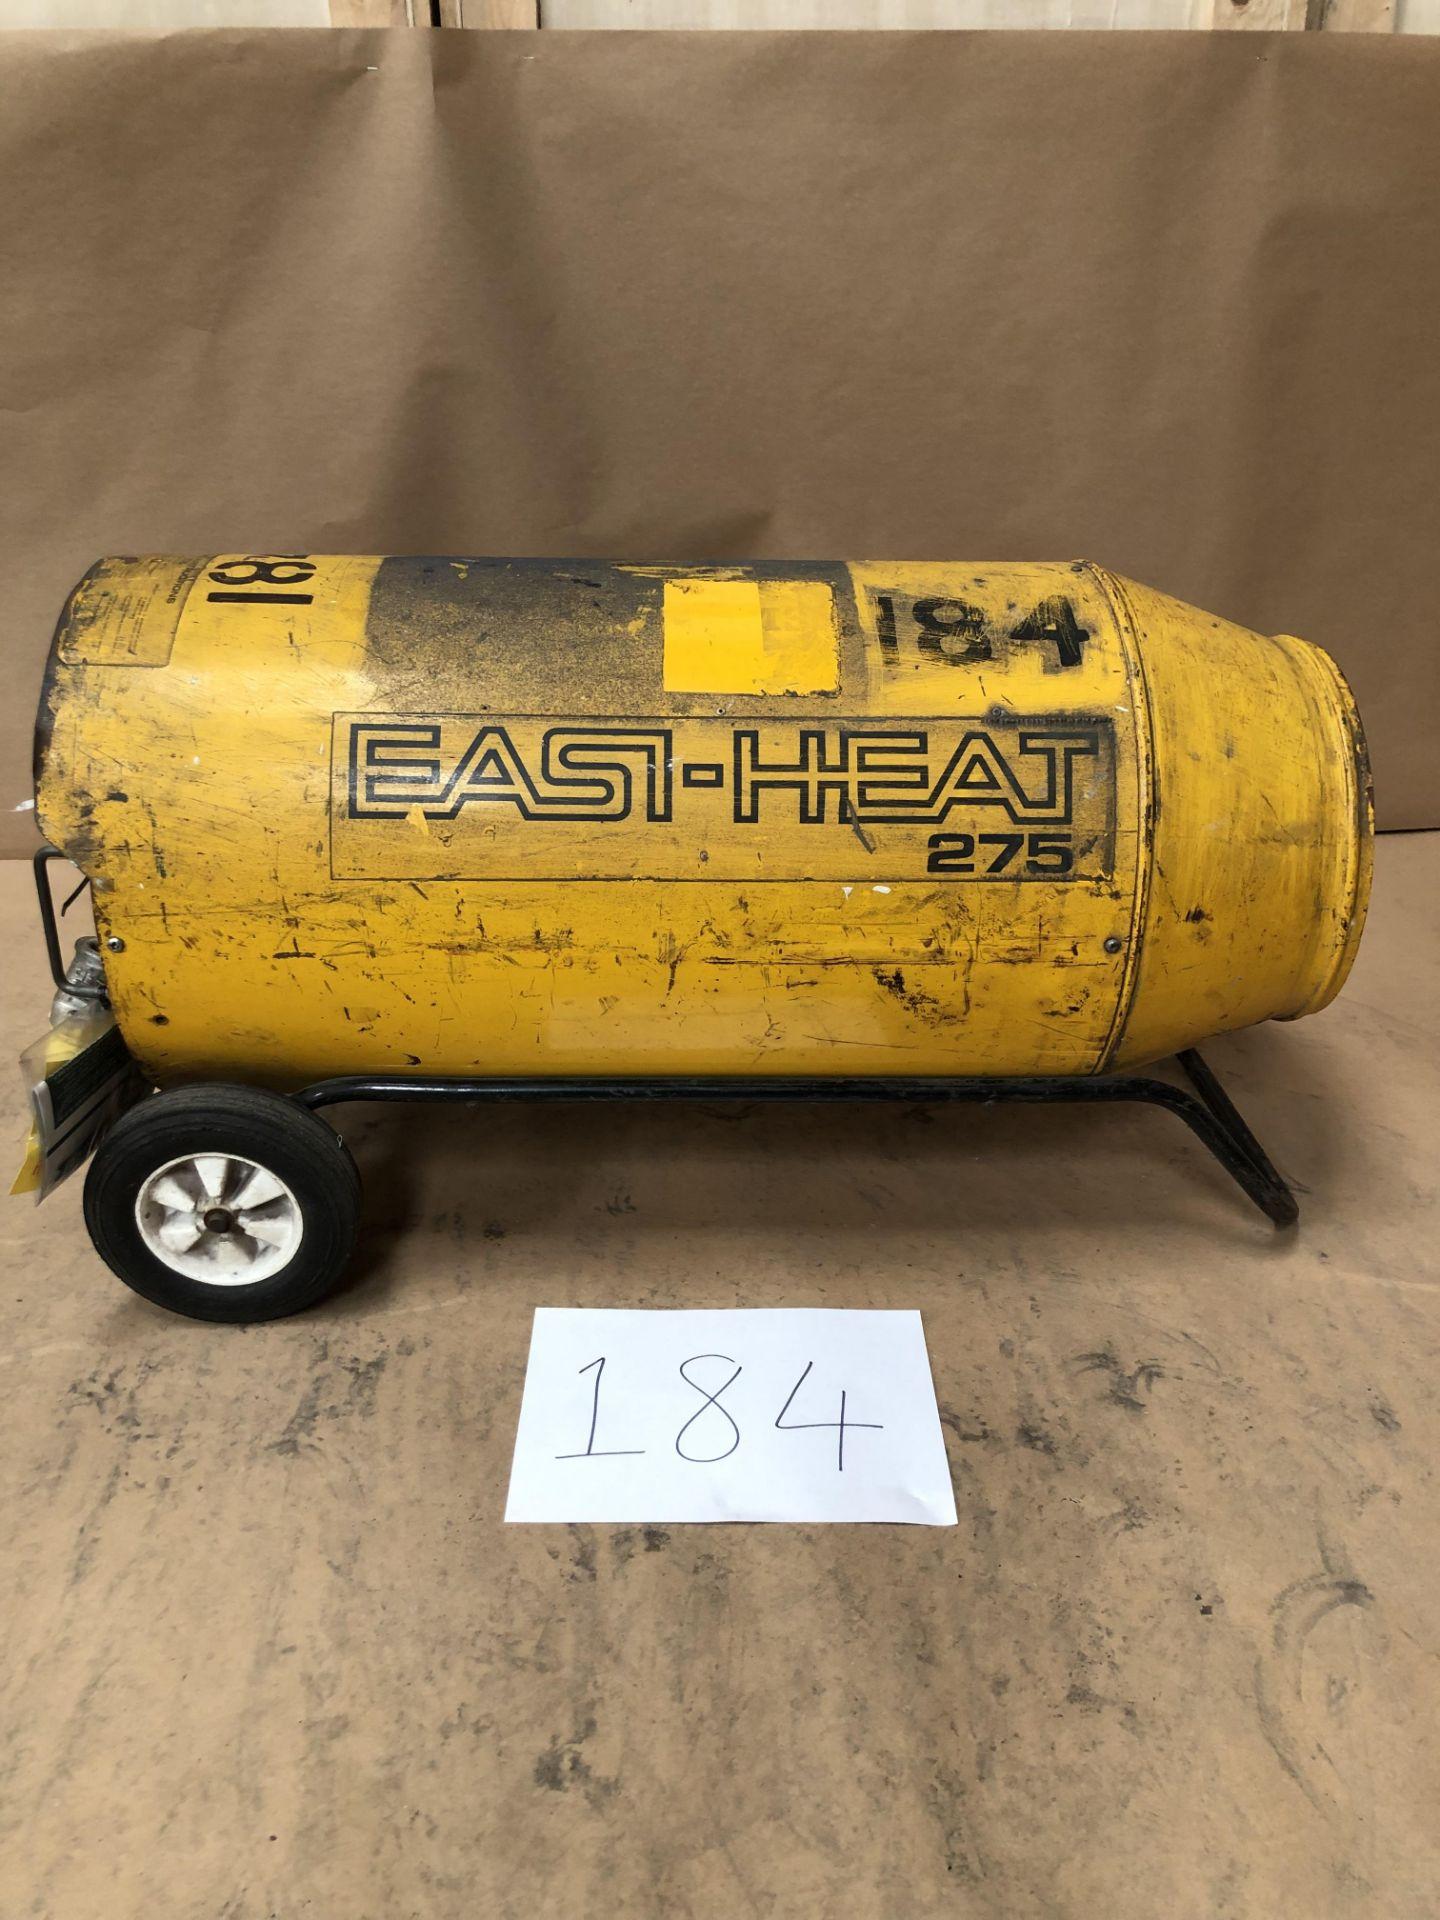 Easyheater 275 Propane Heater